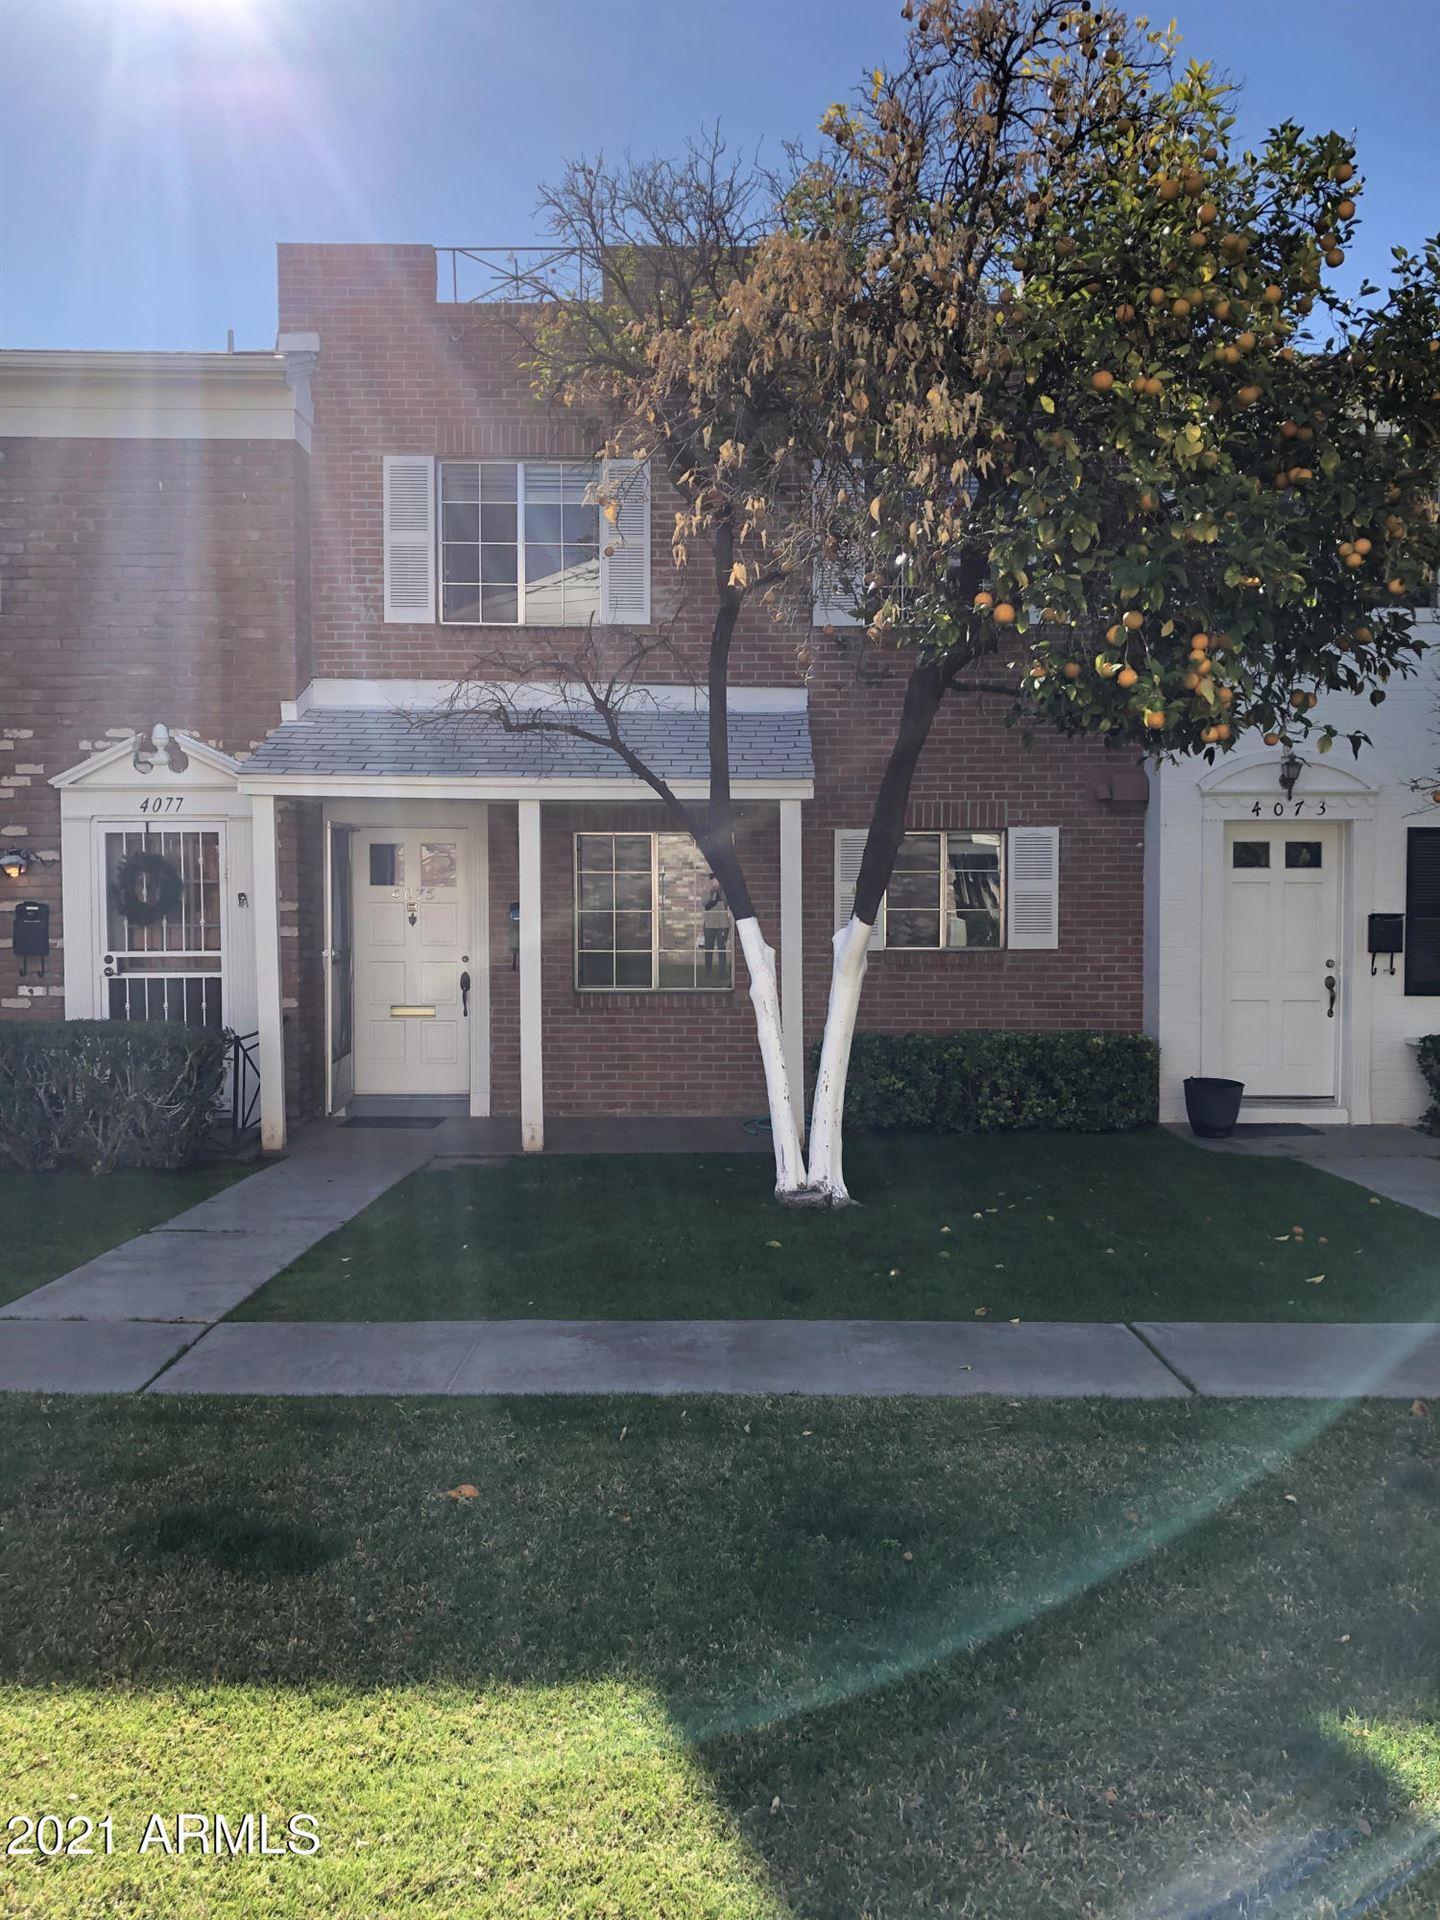 Photo of 4075 E Campbell Avenue, Phoenix, AZ 85018 (MLS # 6200692)